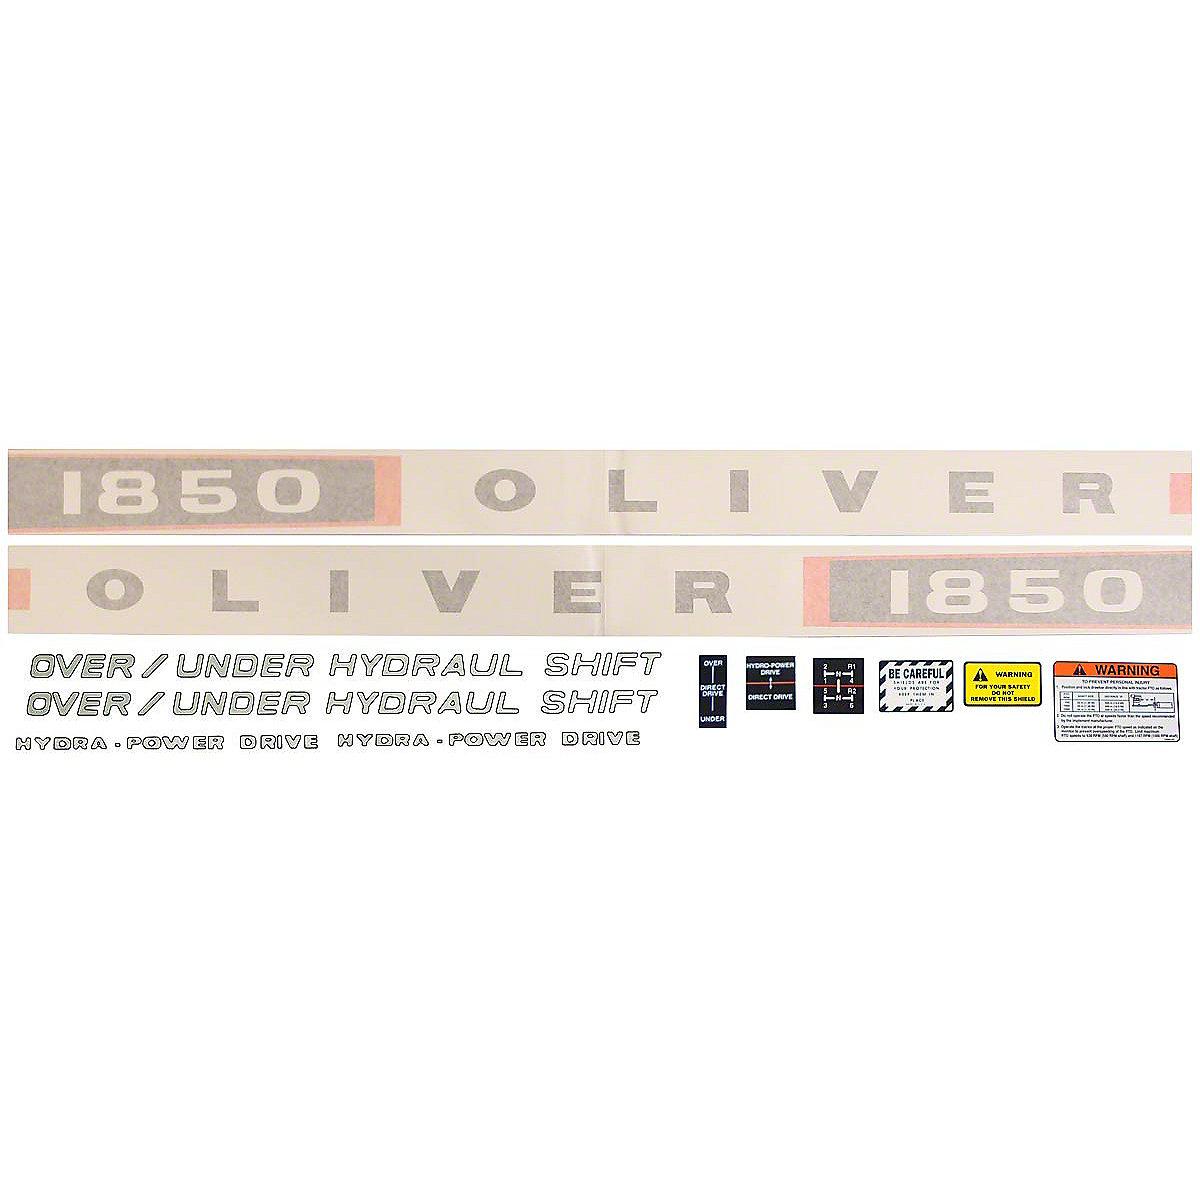 Vinyl Cut Decal Set For Oliver 1850 Gas Tractors.